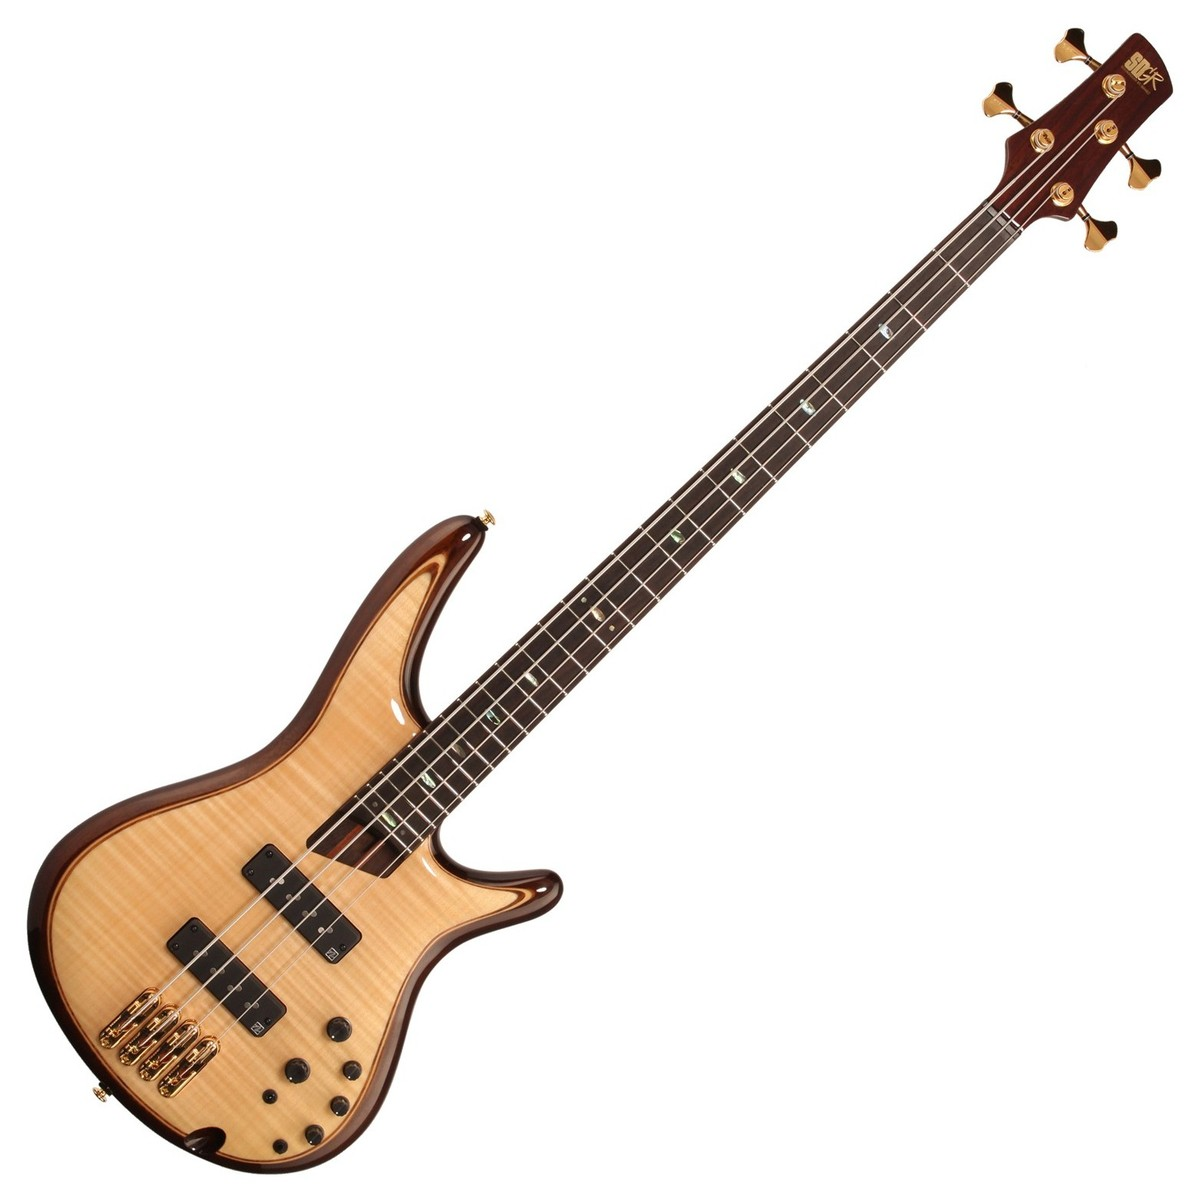 ibanez premium sr1400 bass guitar natural at. Black Bedroom Furniture Sets. Home Design Ideas